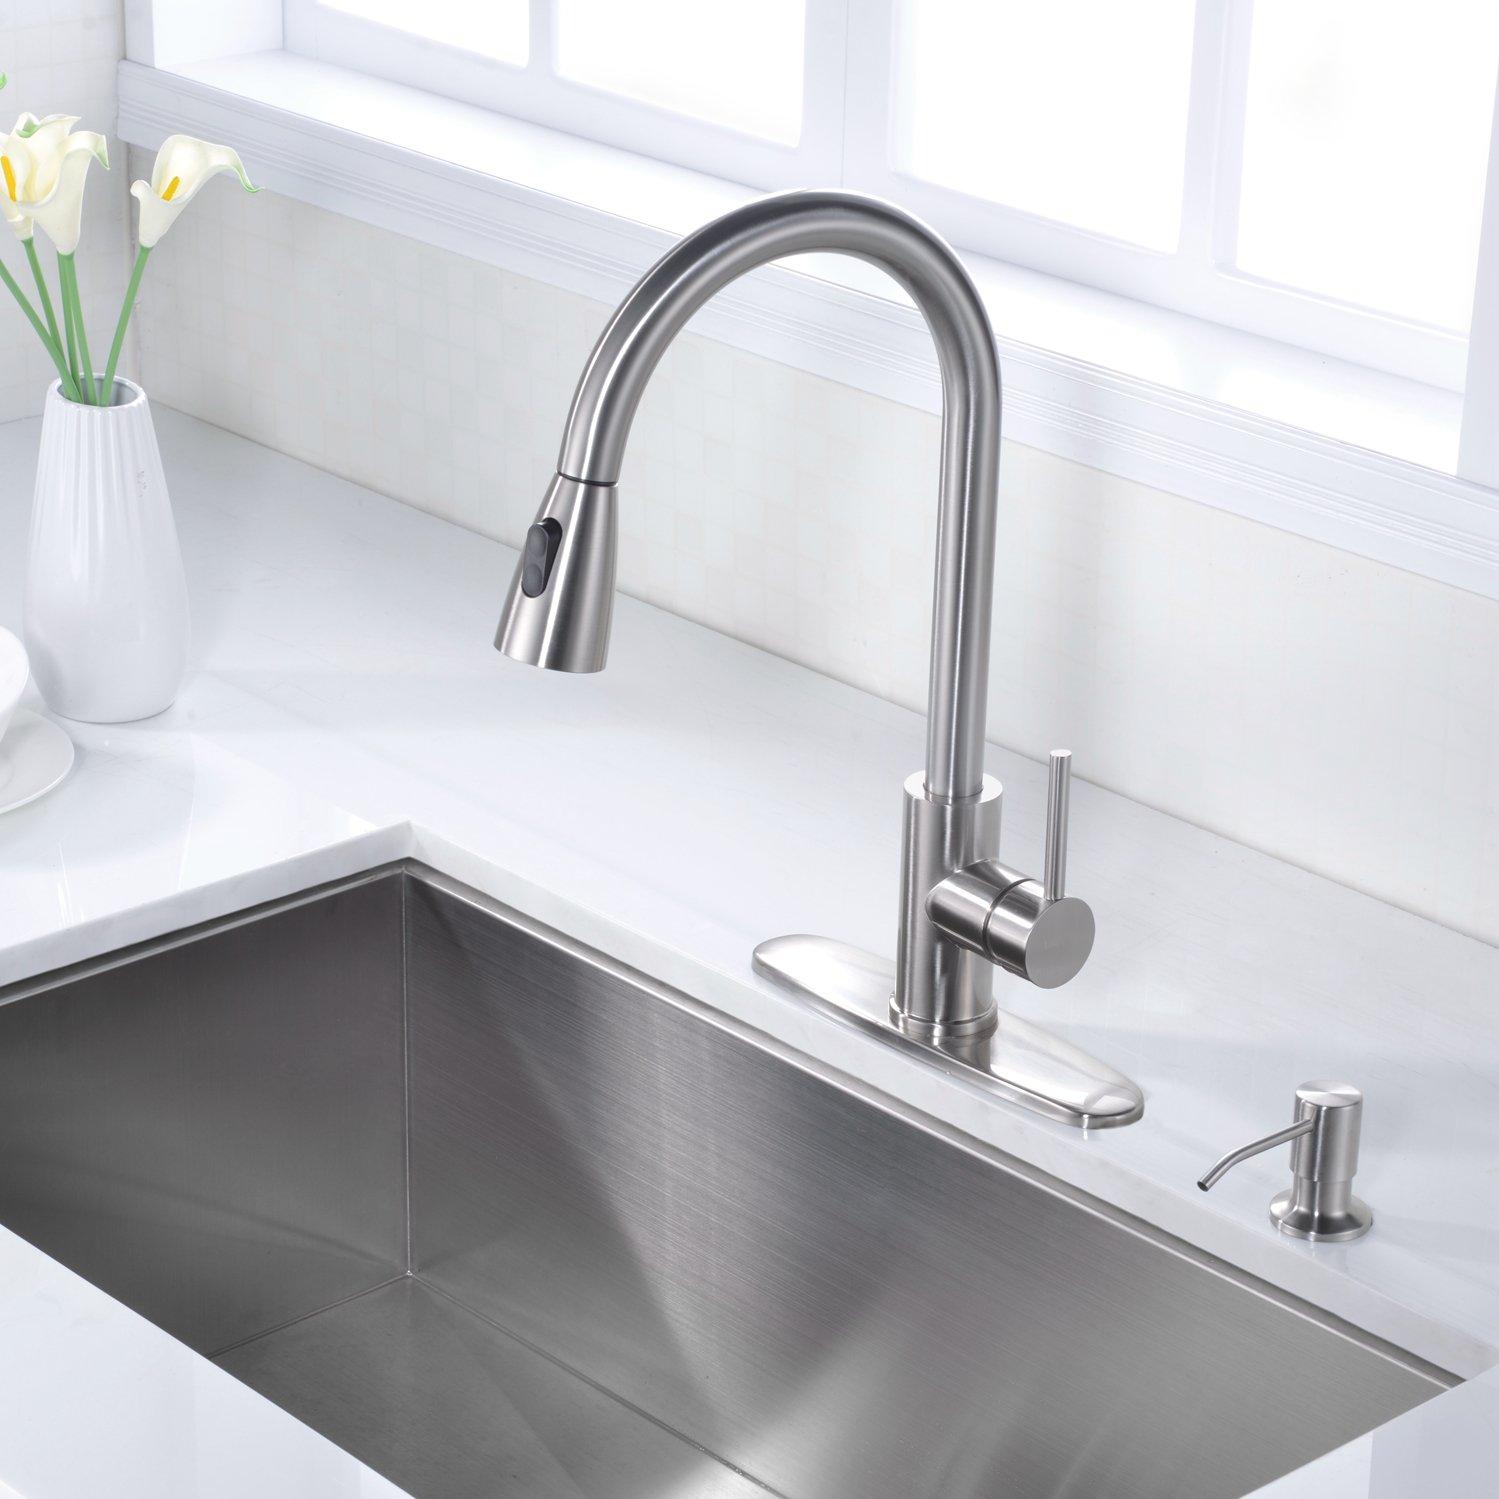 LZD Stainless Steel Sink Soap Dispenser,Built in Hand Soap Dispenser Pump, Large Capacity 17 OZ Bottle, Brushed Nickel by LAZADA HOME (Image #5)